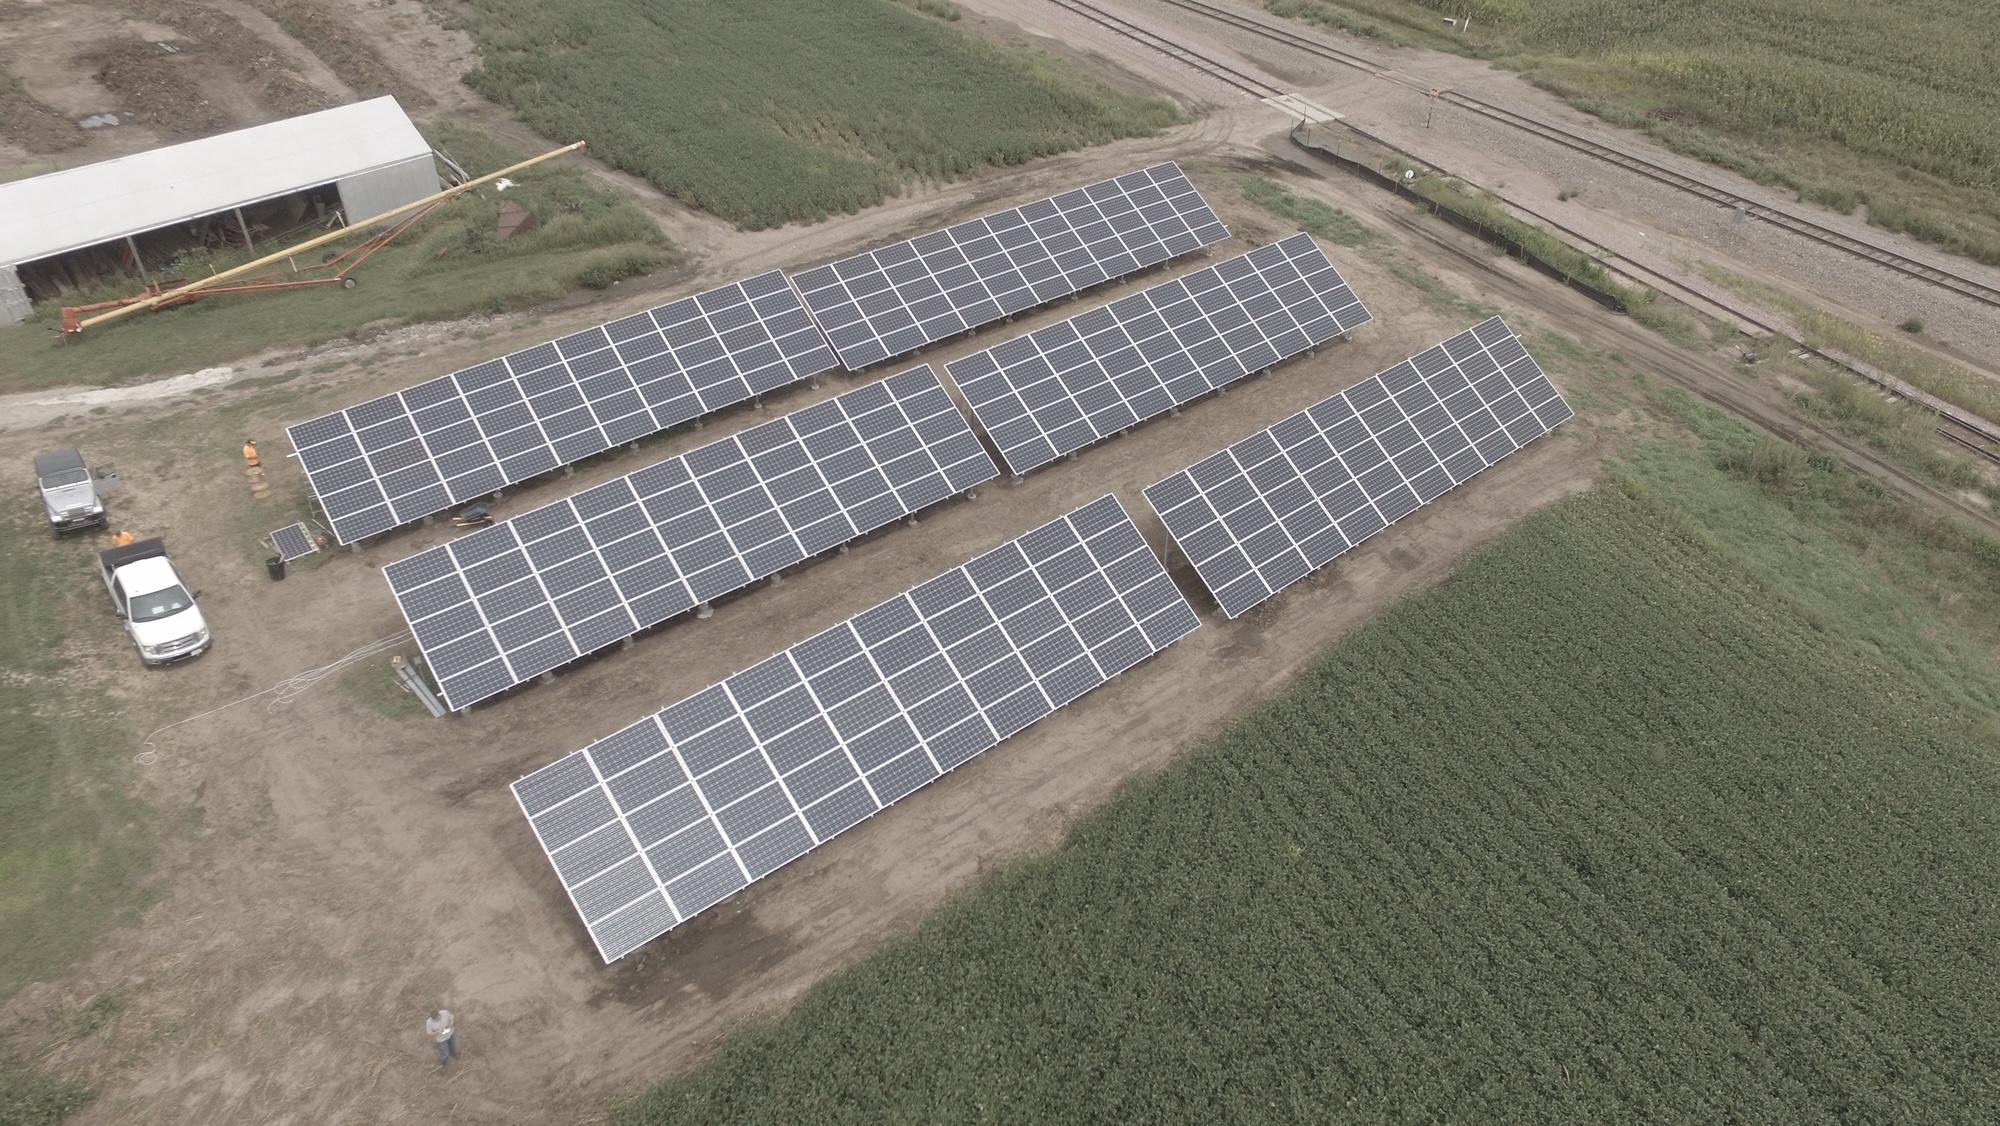 Bird's eye view of a solar installation